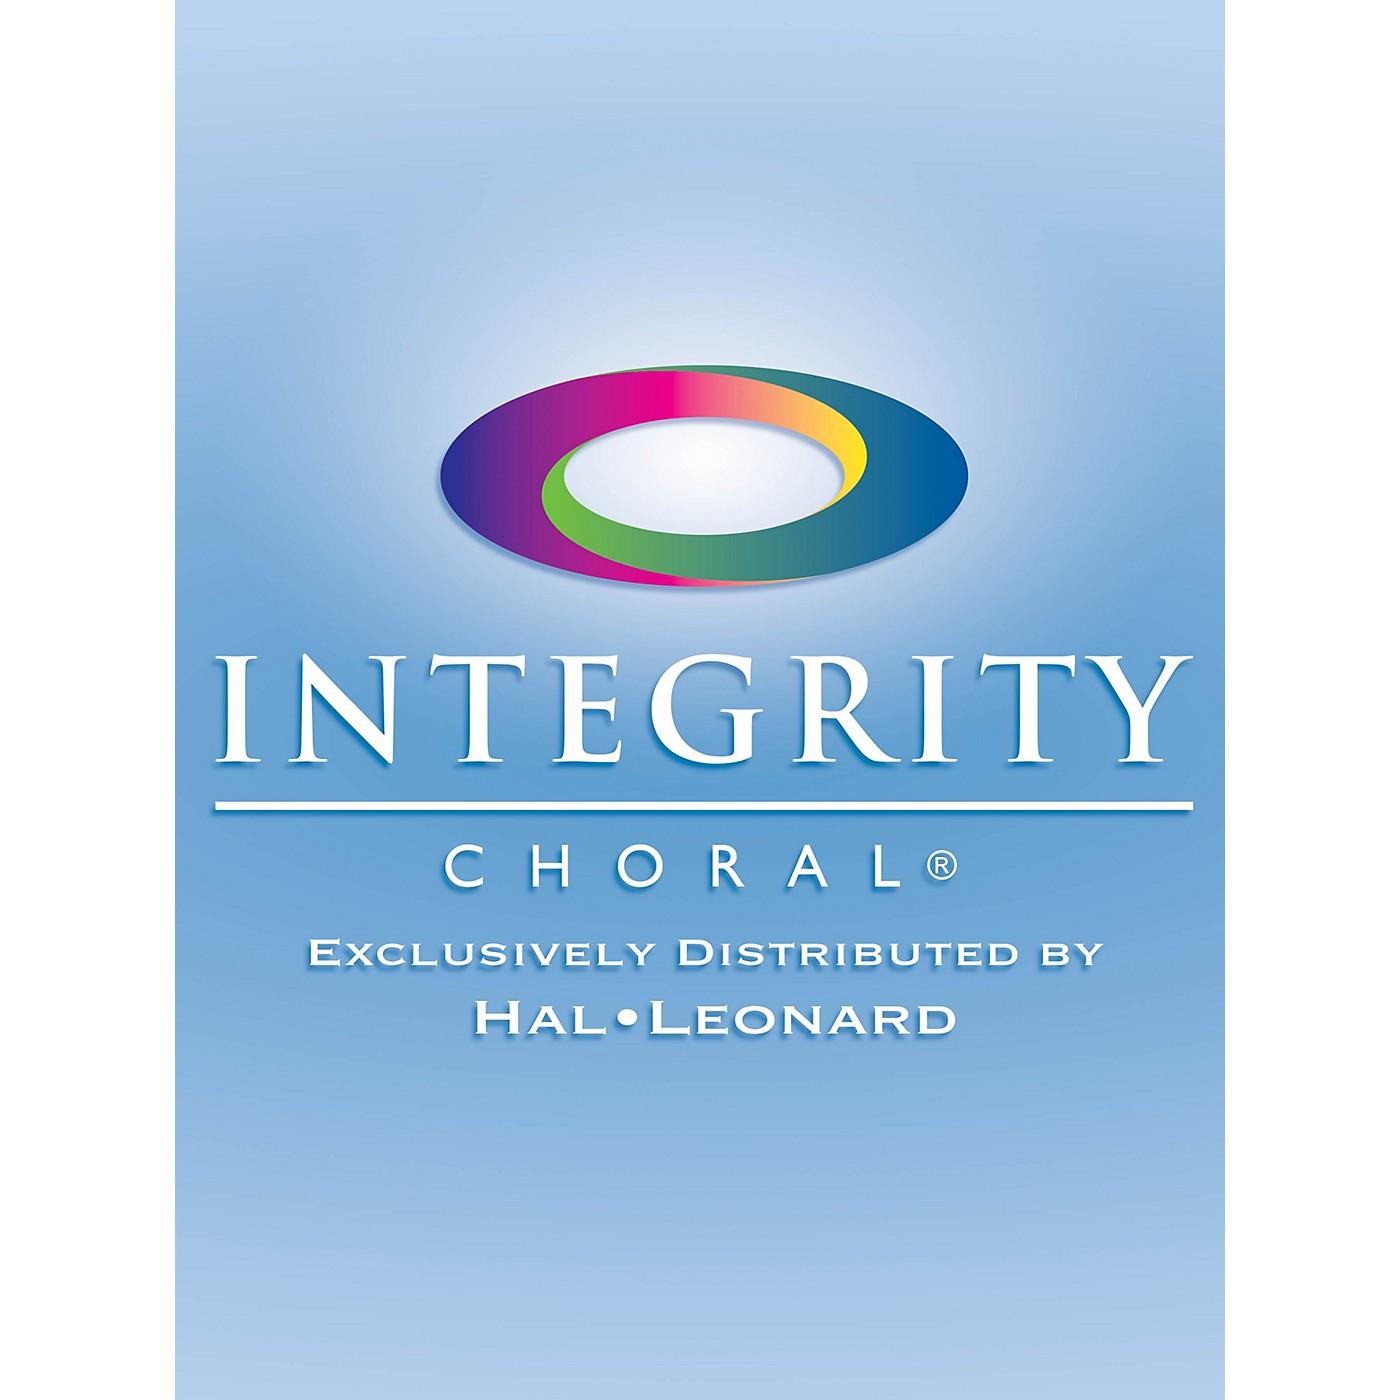 Integrity Choral Made Me Glad IPAKO Arranged by BJ Davis/Richard Kingsmore/J. Daniel Smith thumbnail